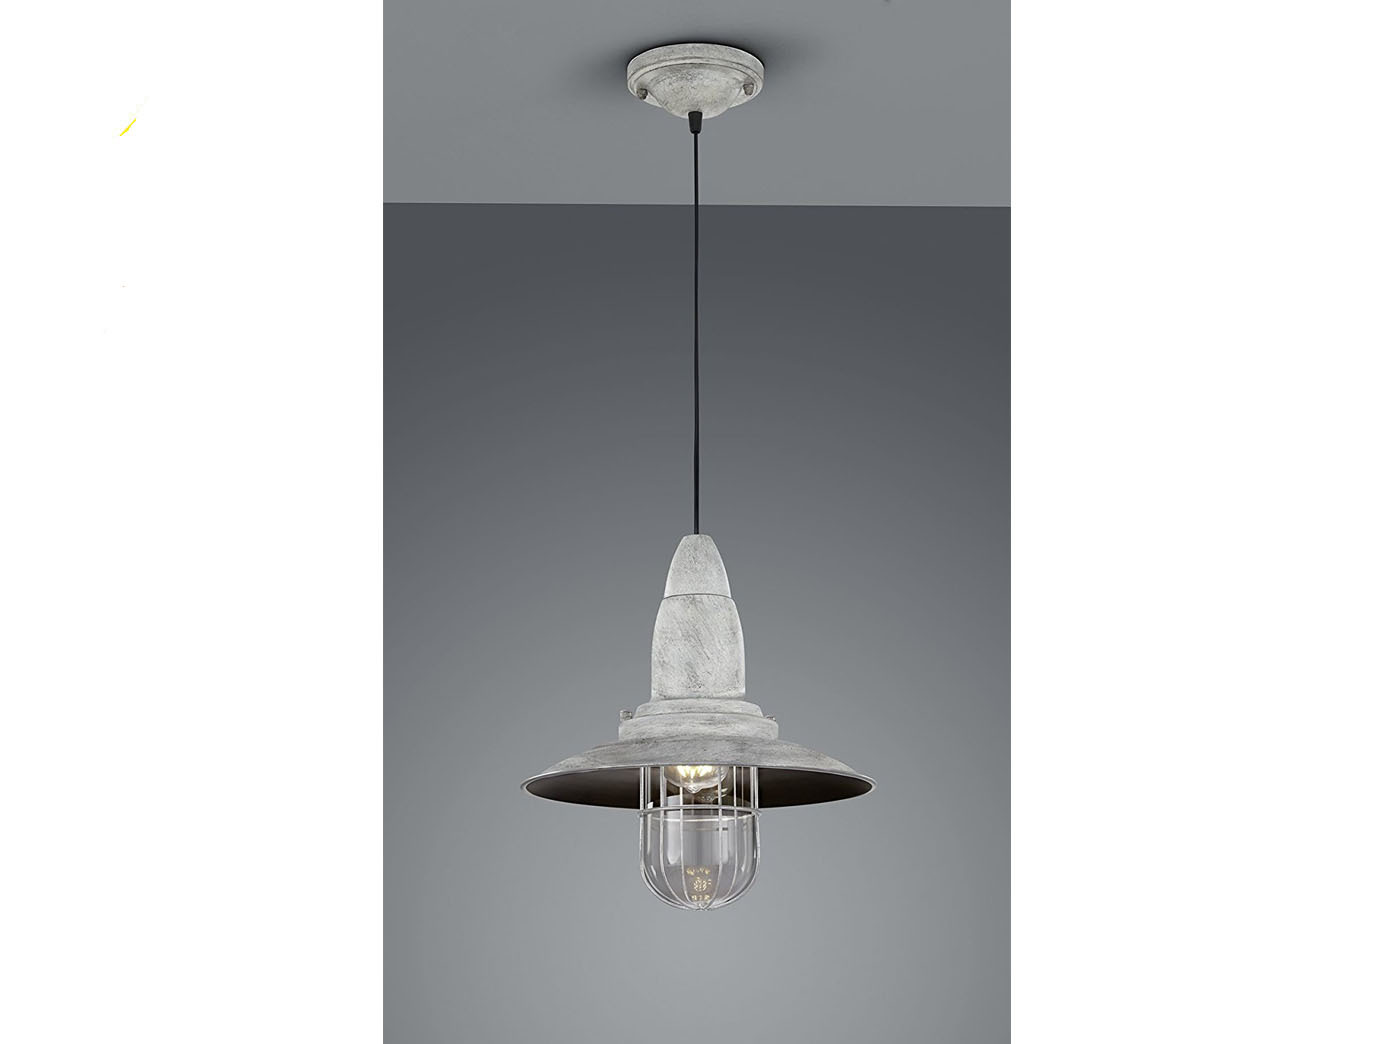 Led pendelleuchte industrie lampenschirm grau antik glas for Led lampenschirm